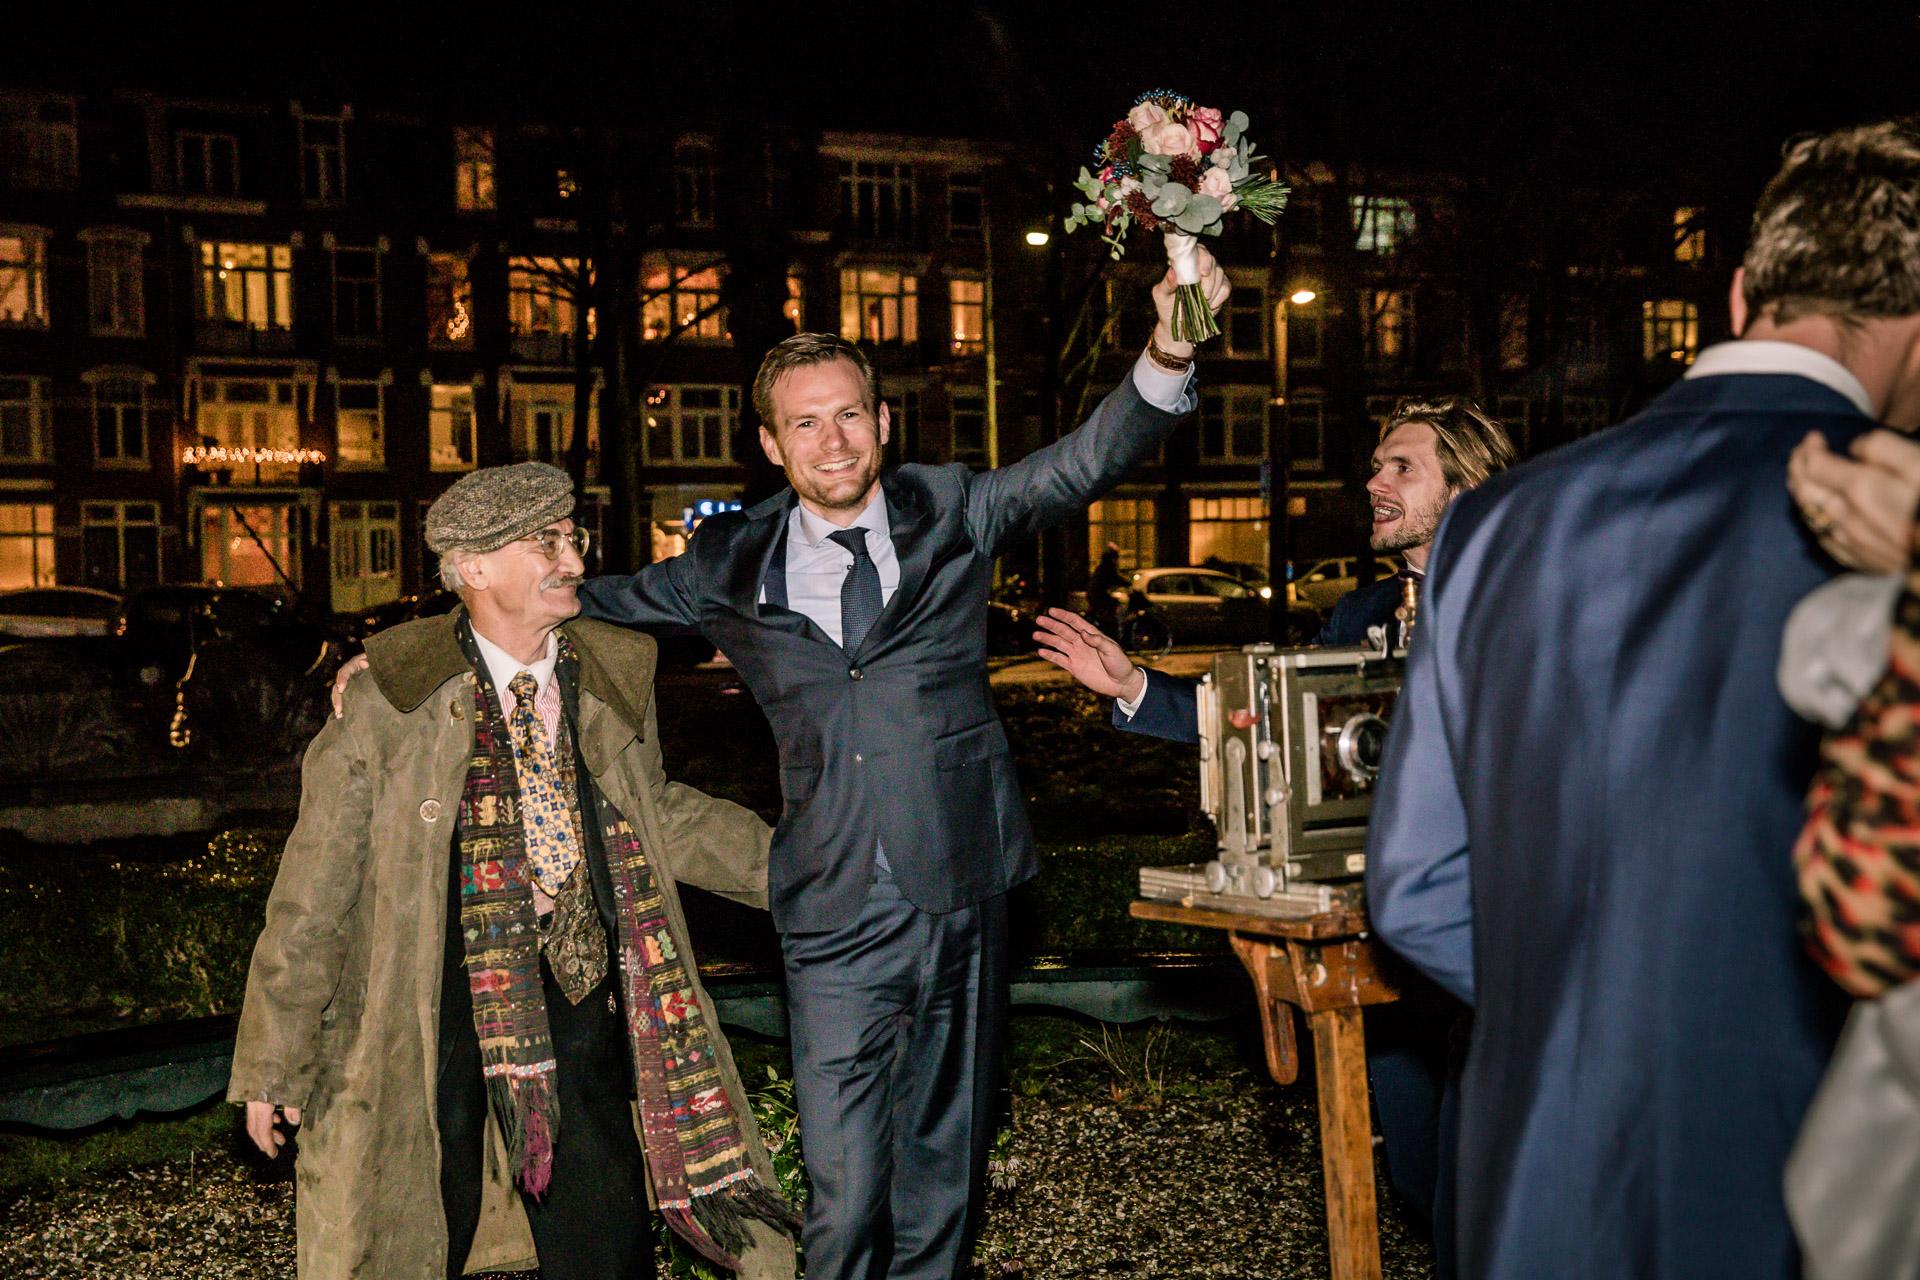 Winter bruiloft in Amsterdam